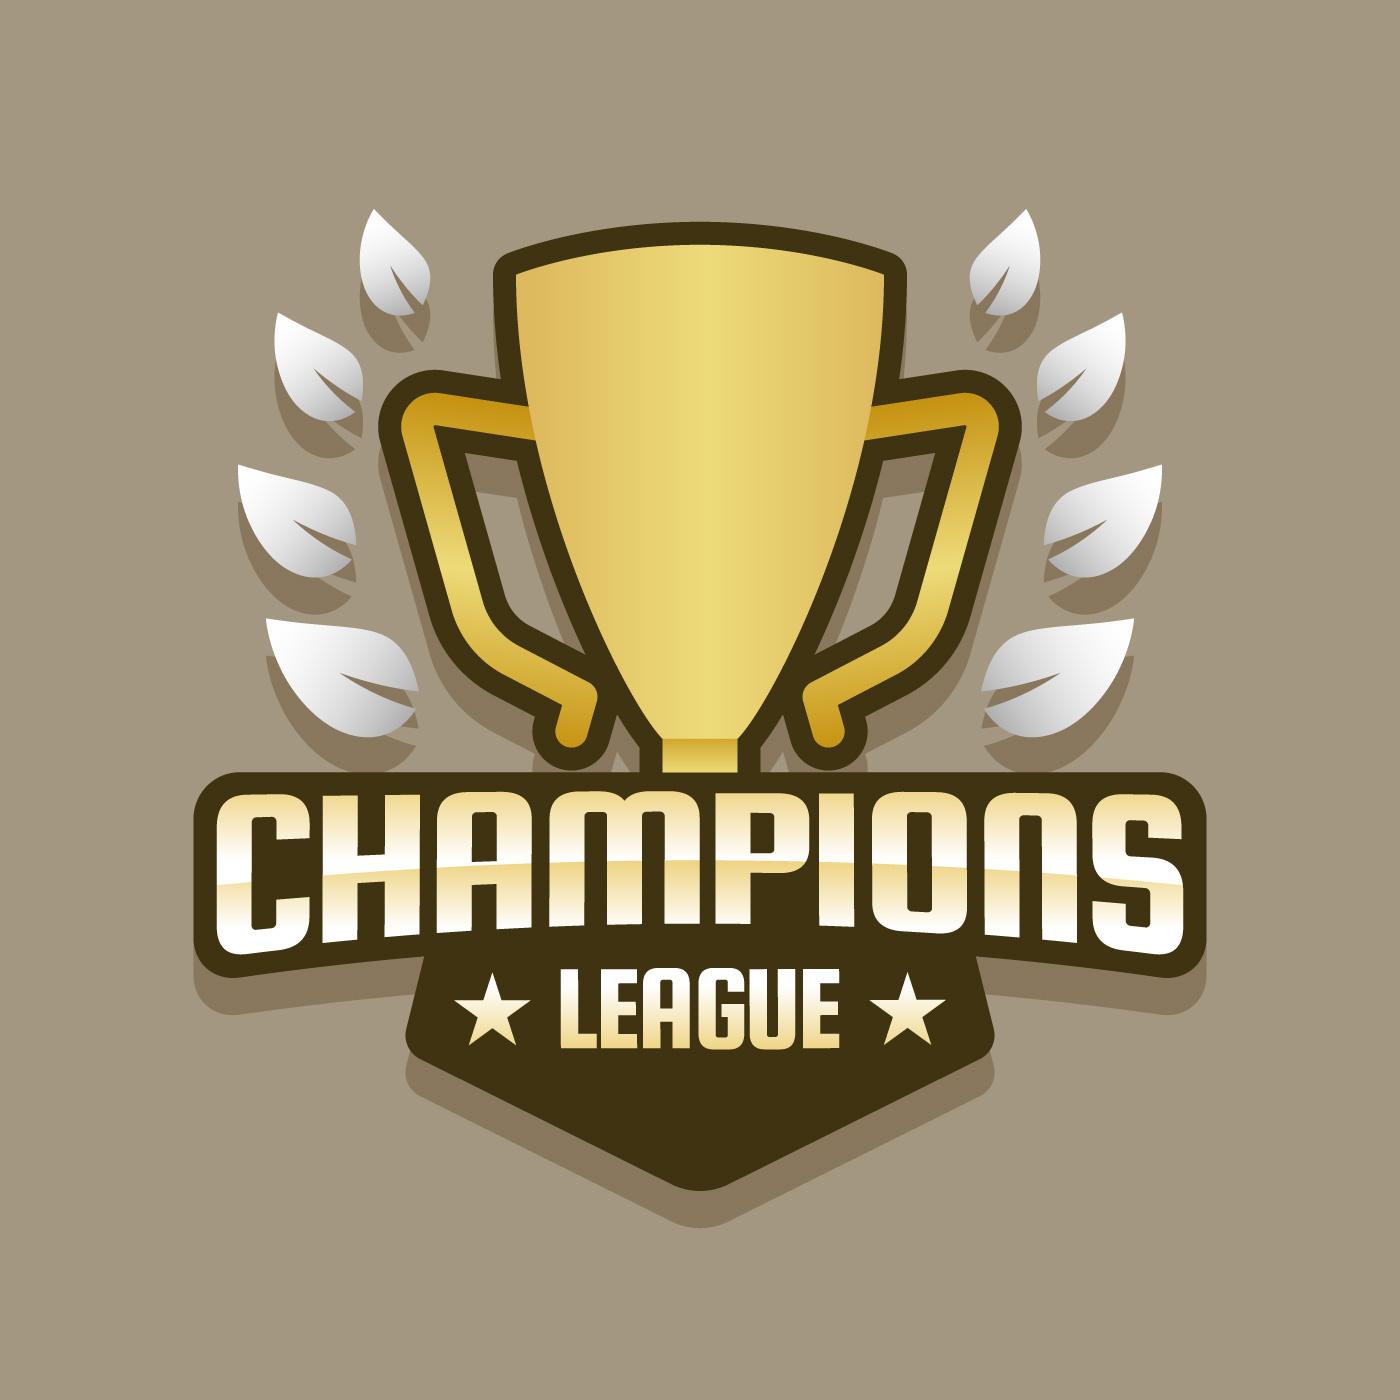 Champions League Vector: Outstanding Champions Vectors